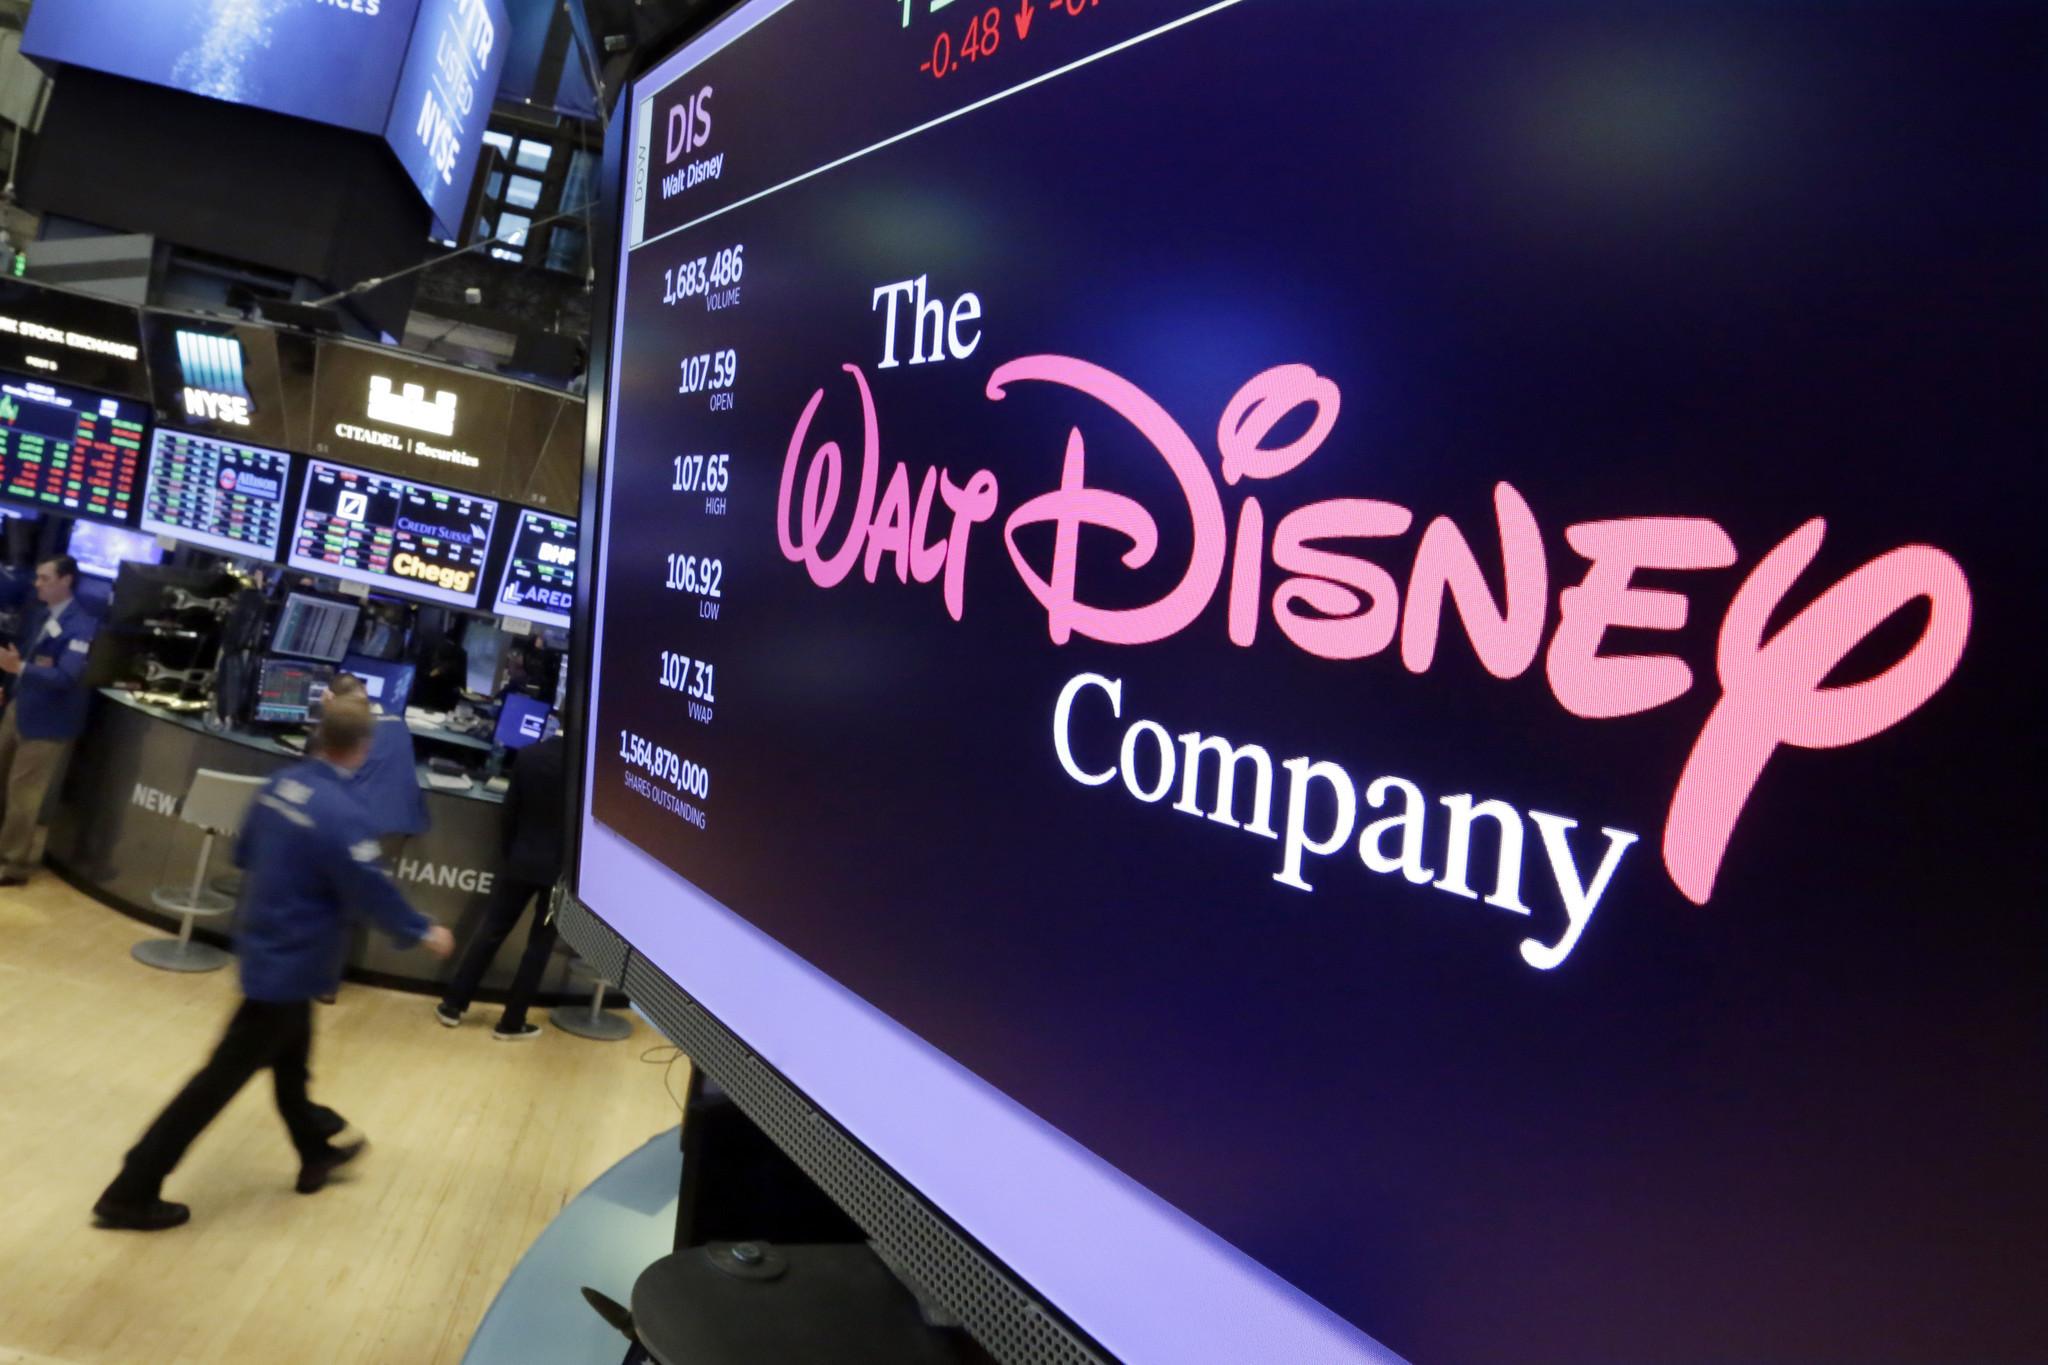 Disney's bid for Fox clears U.S. antitrust hurdle